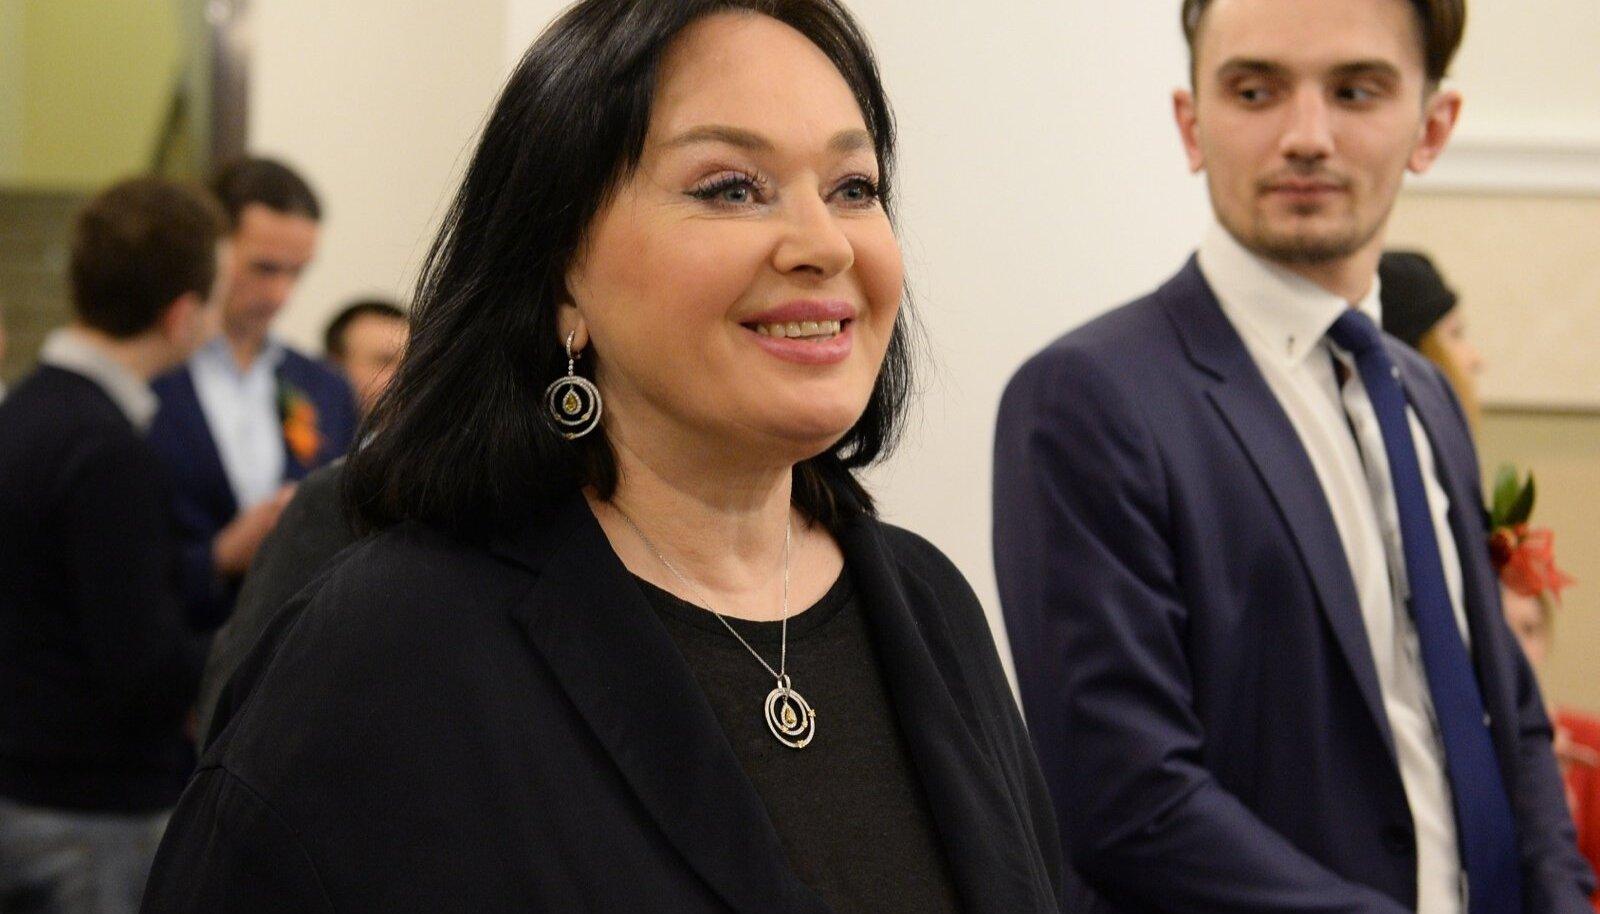 Dzhakhan Pollyeva's anniversary gala